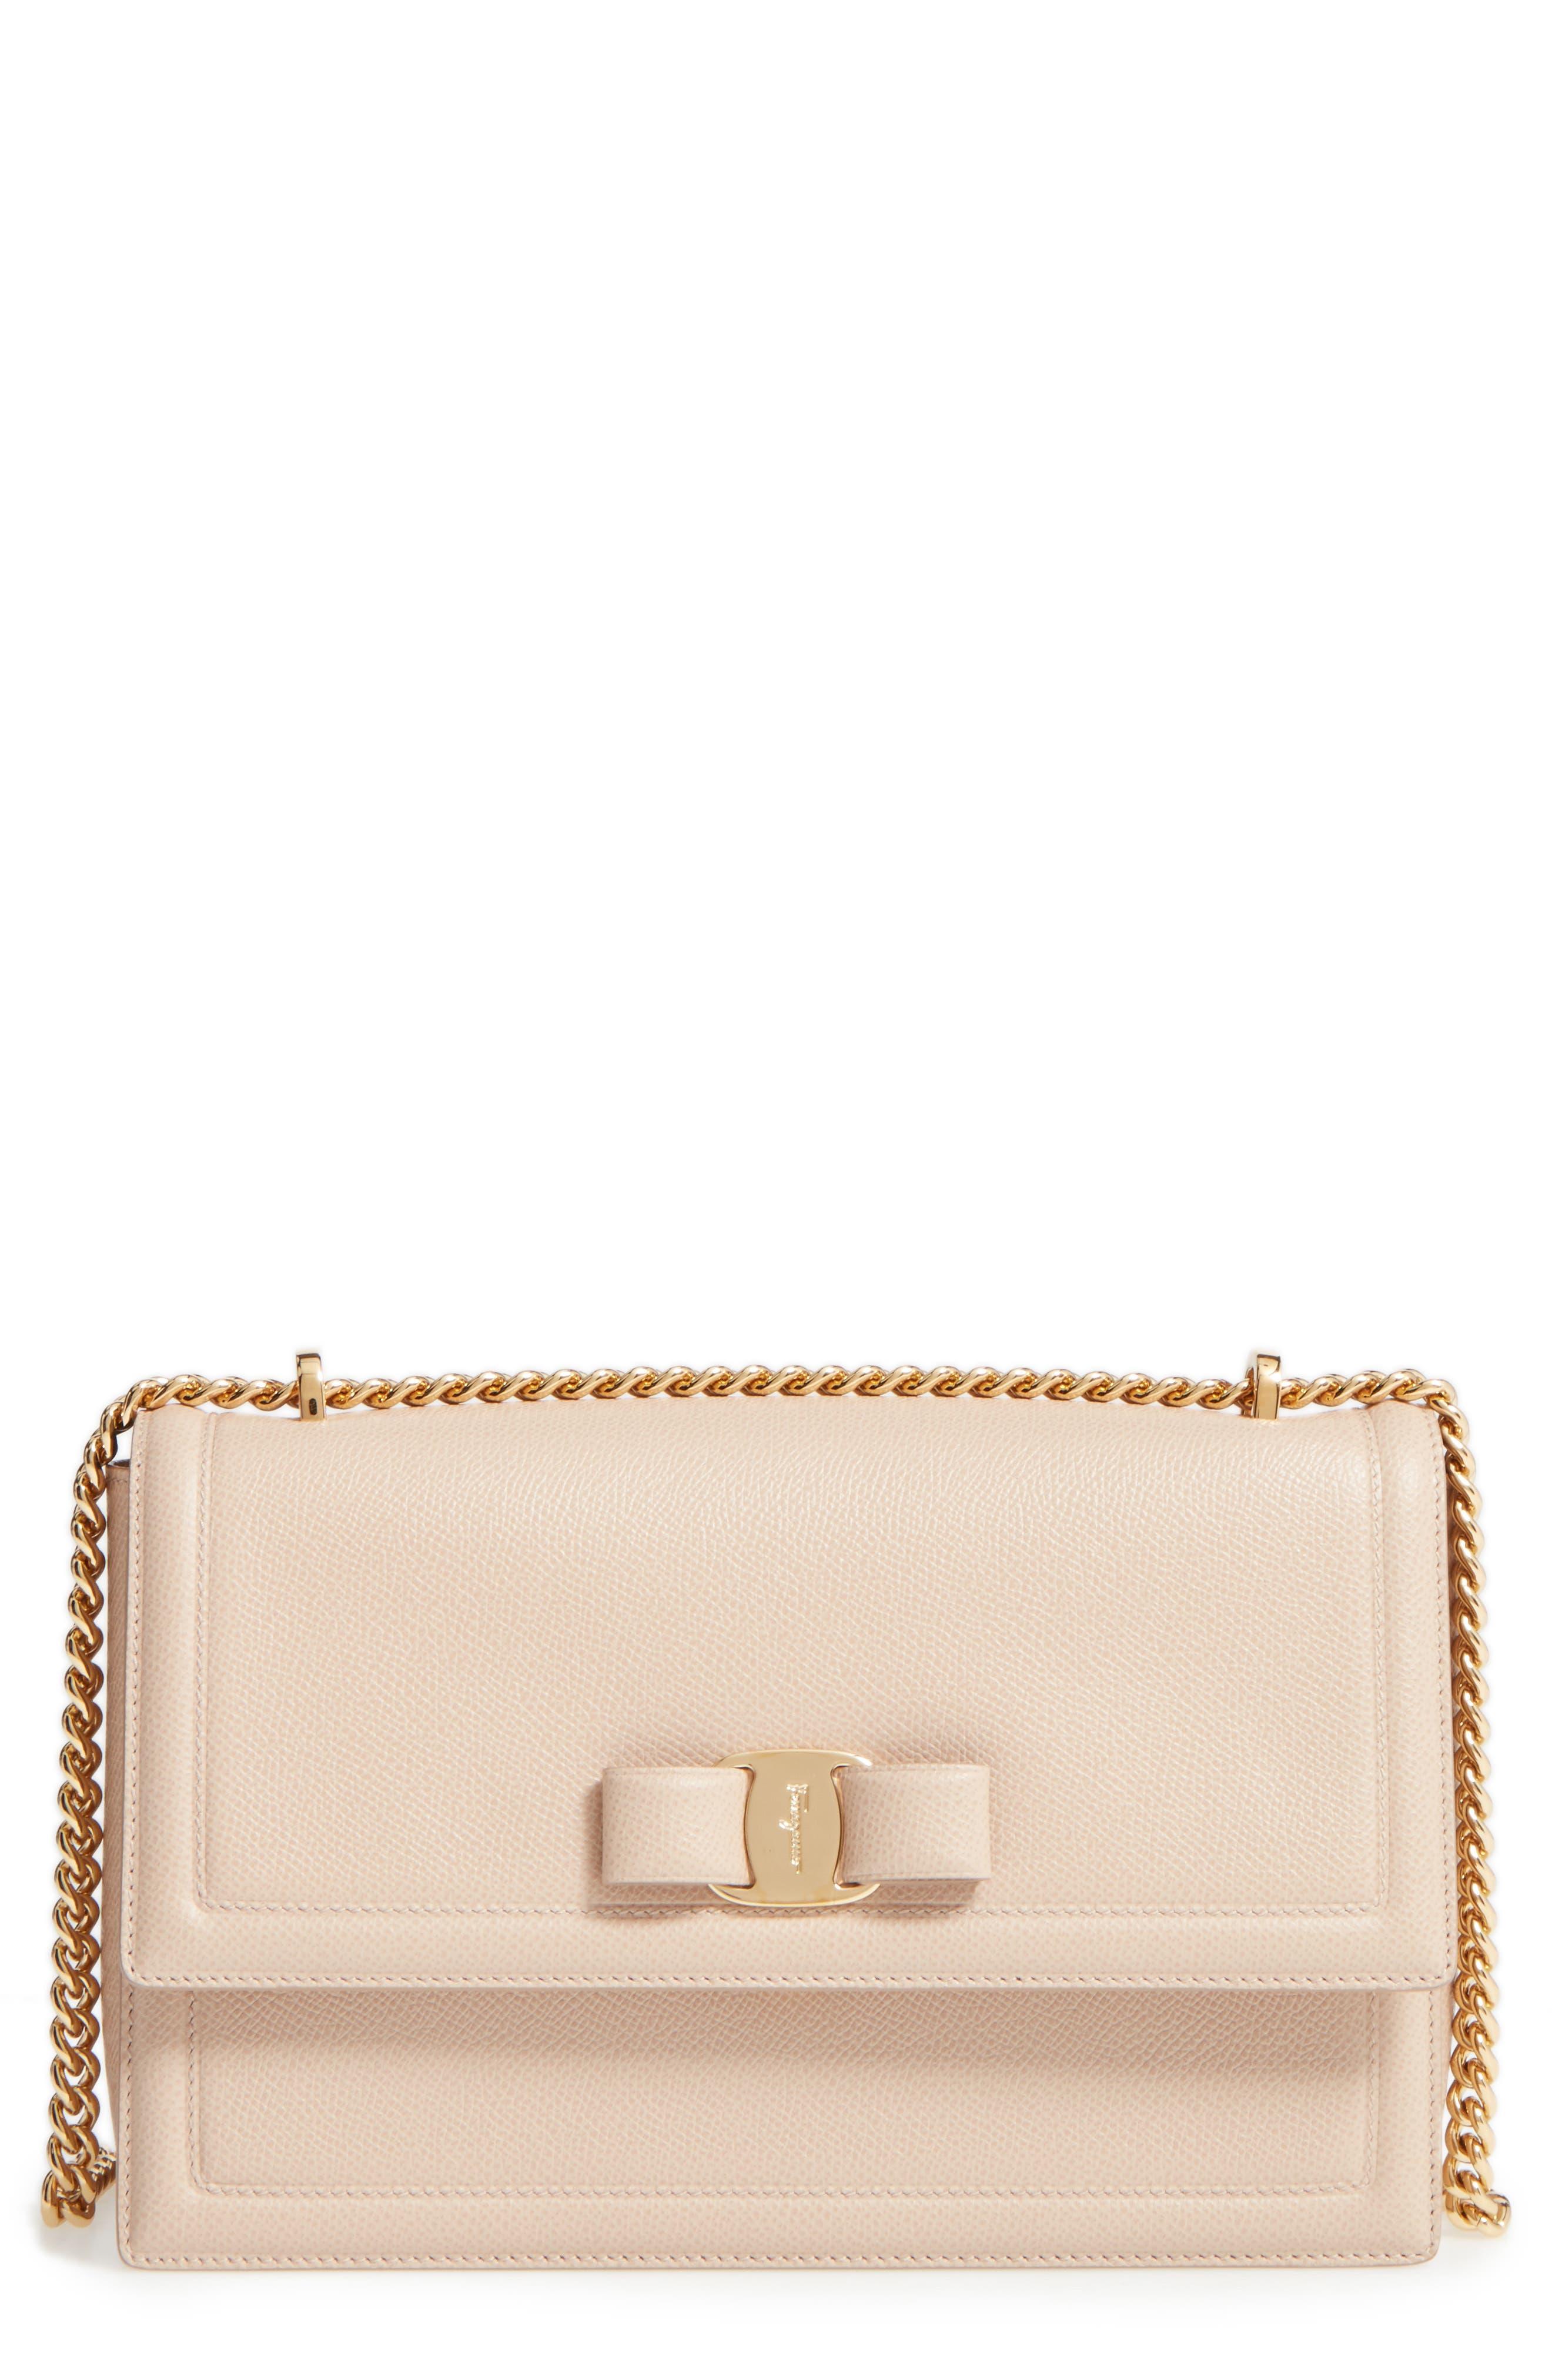 Medium Leather Shoulder Bag,                             Main thumbnail 1, color,